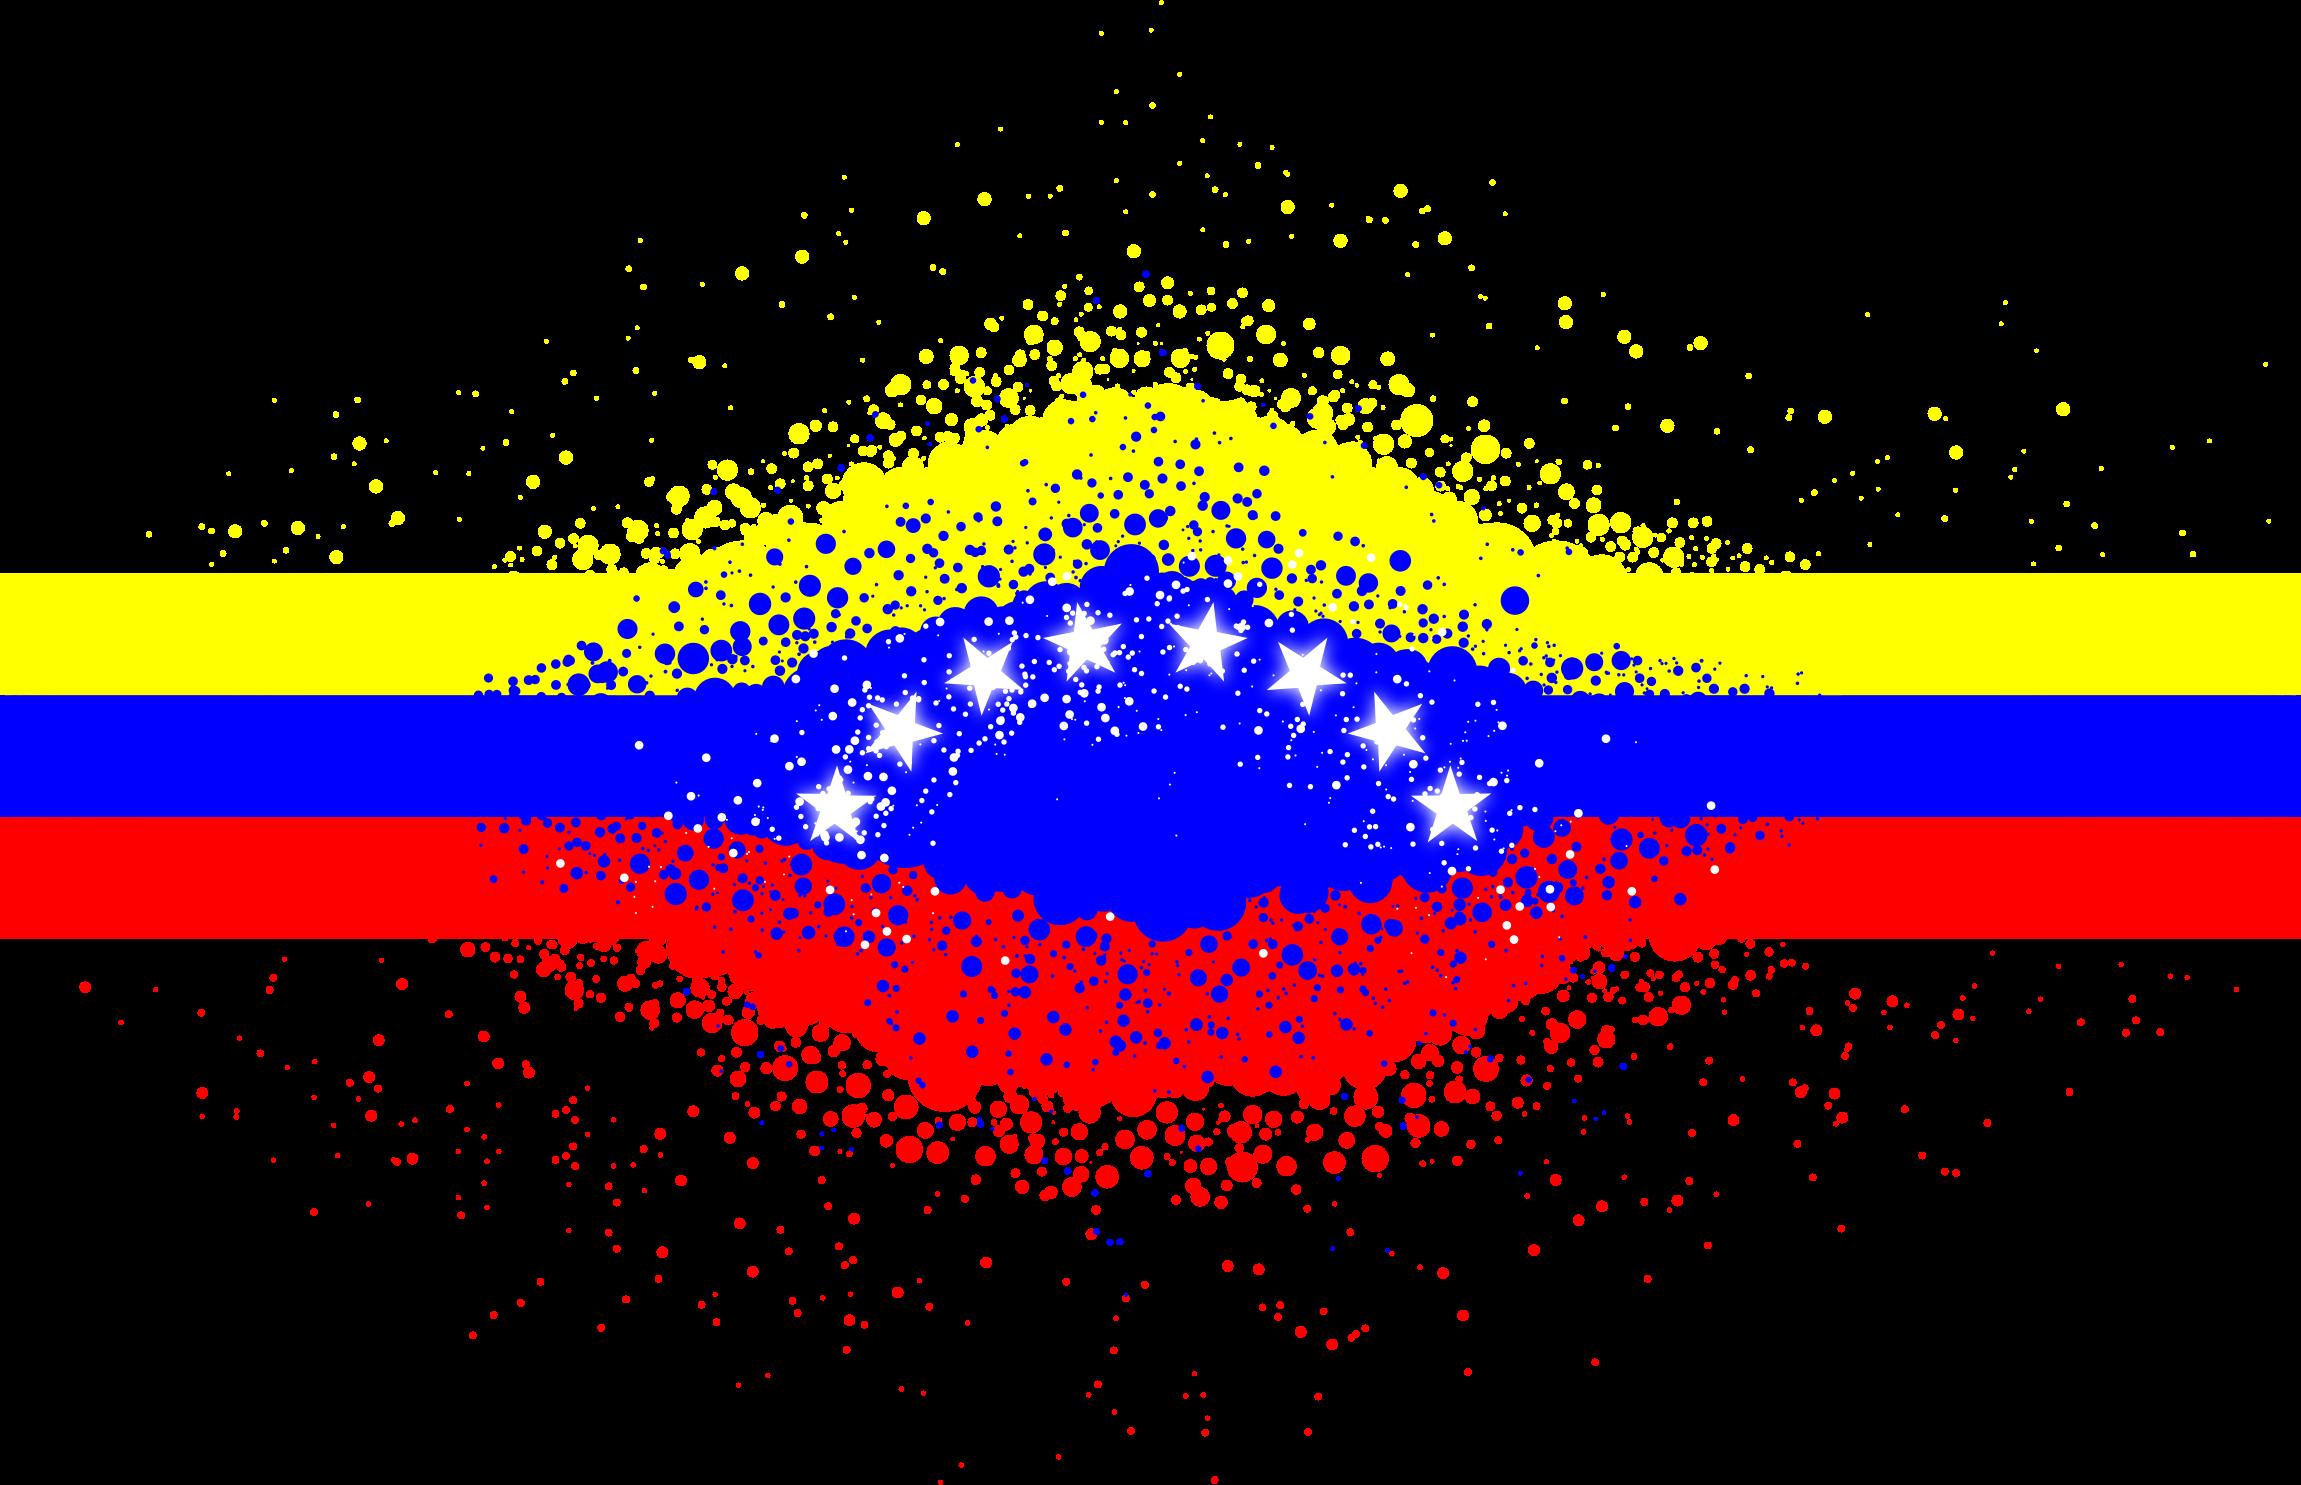 Venezuela clipart #15, Download drawings